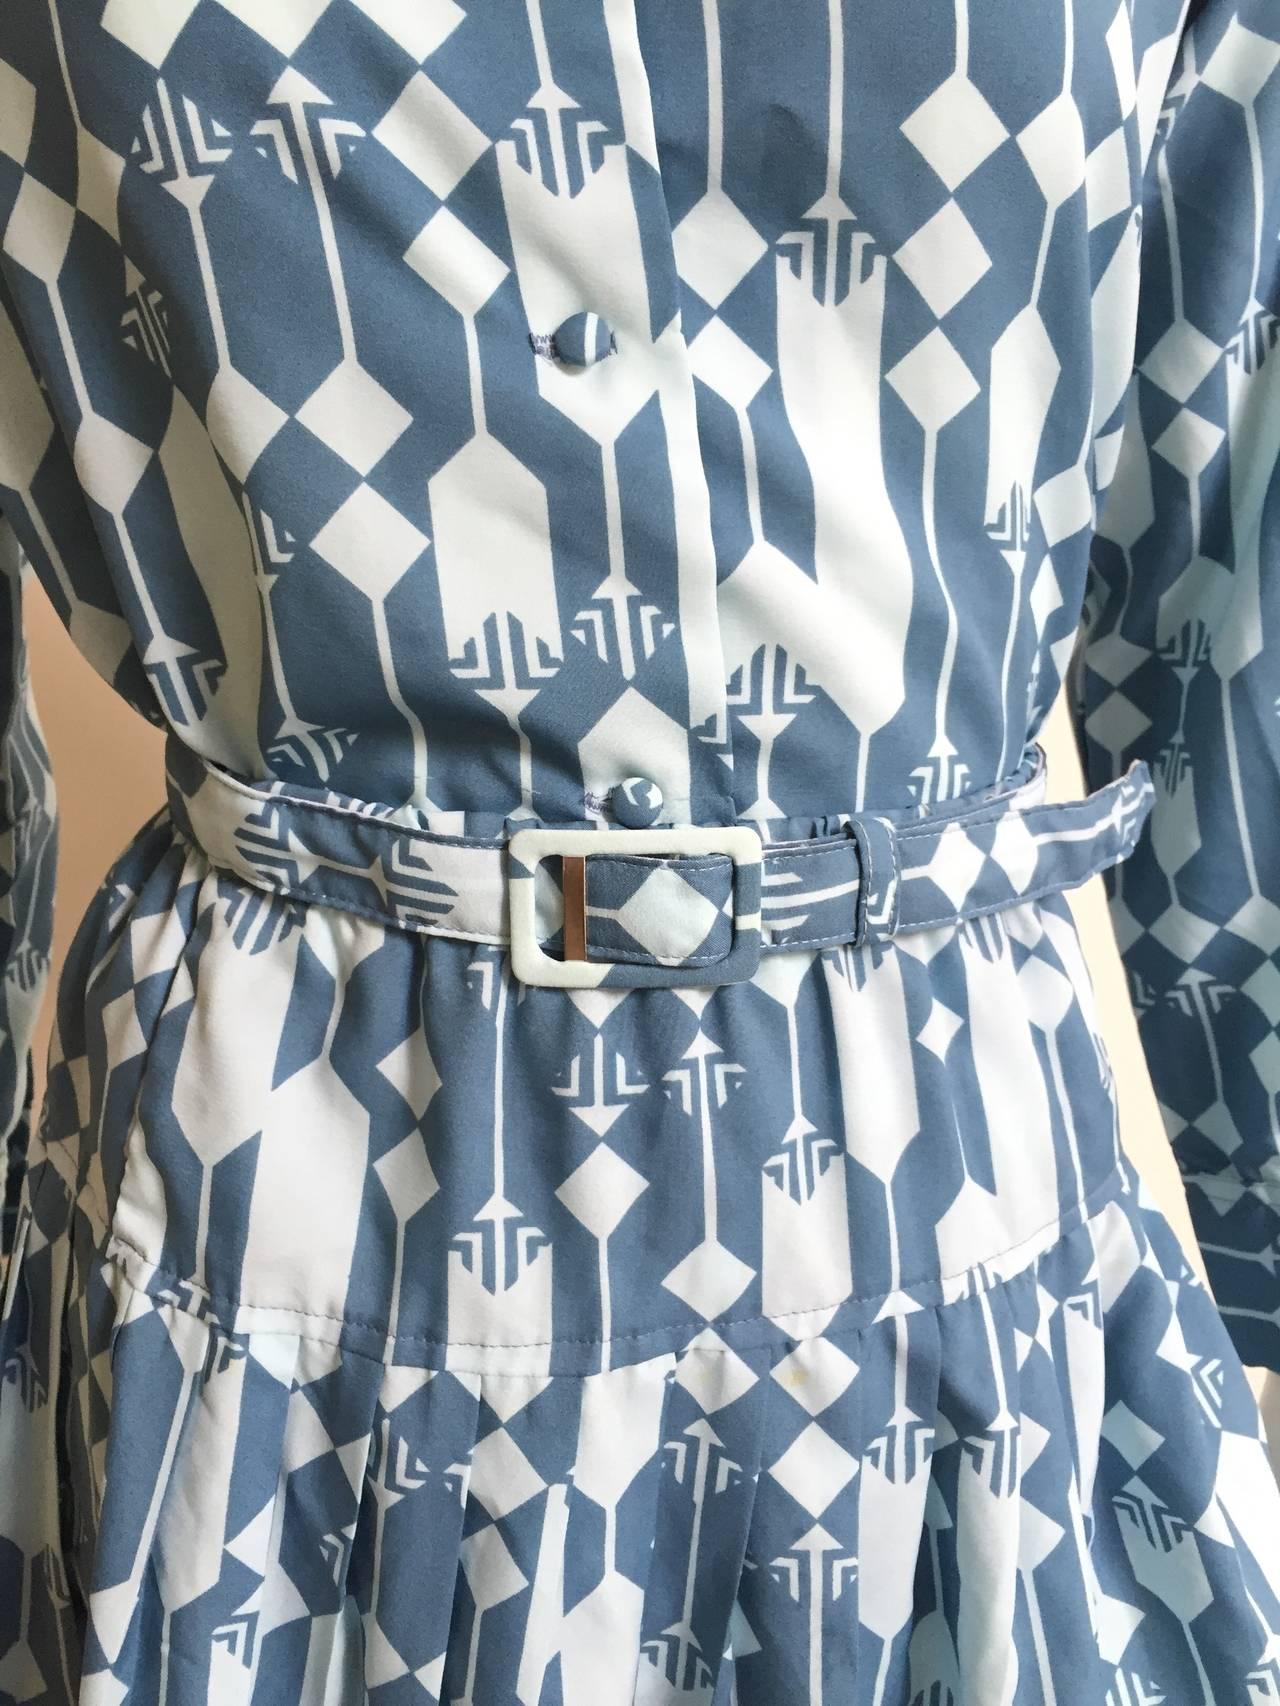 Gray Lanvin Blouse, Skirt & Belt Dress Set Size 8. For Sale